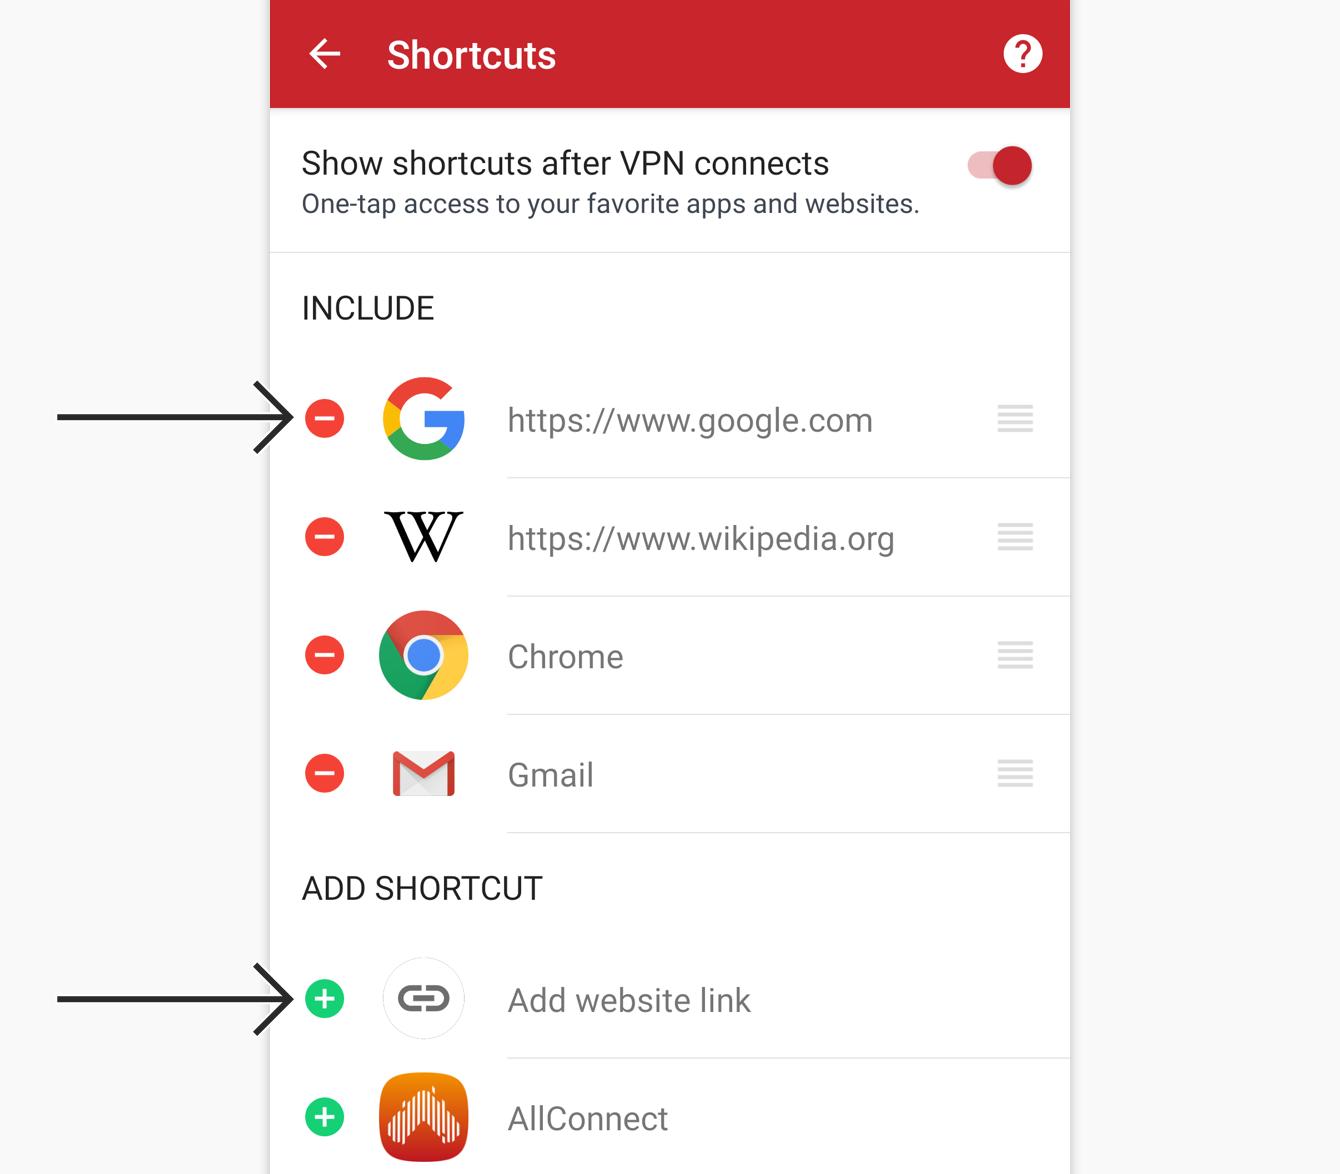 Tap the add or remove icon to add or remove a shortcut.